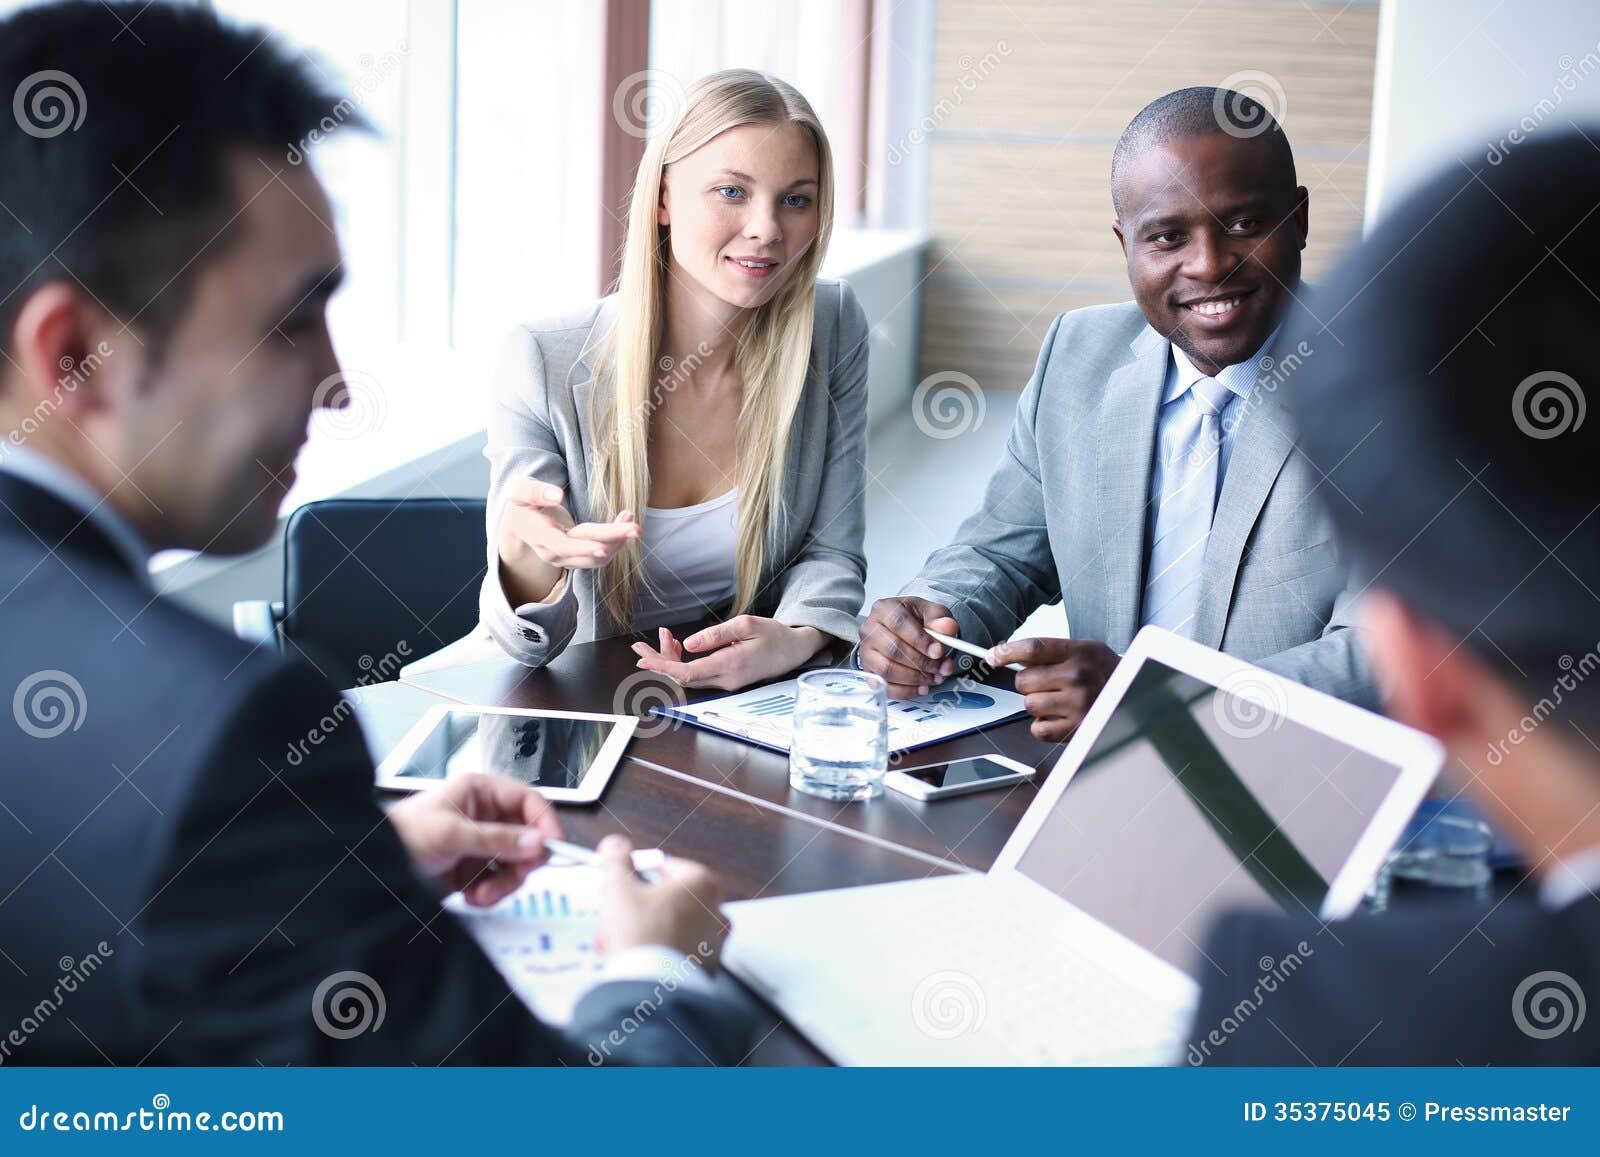 negotiation royalty free stock photo